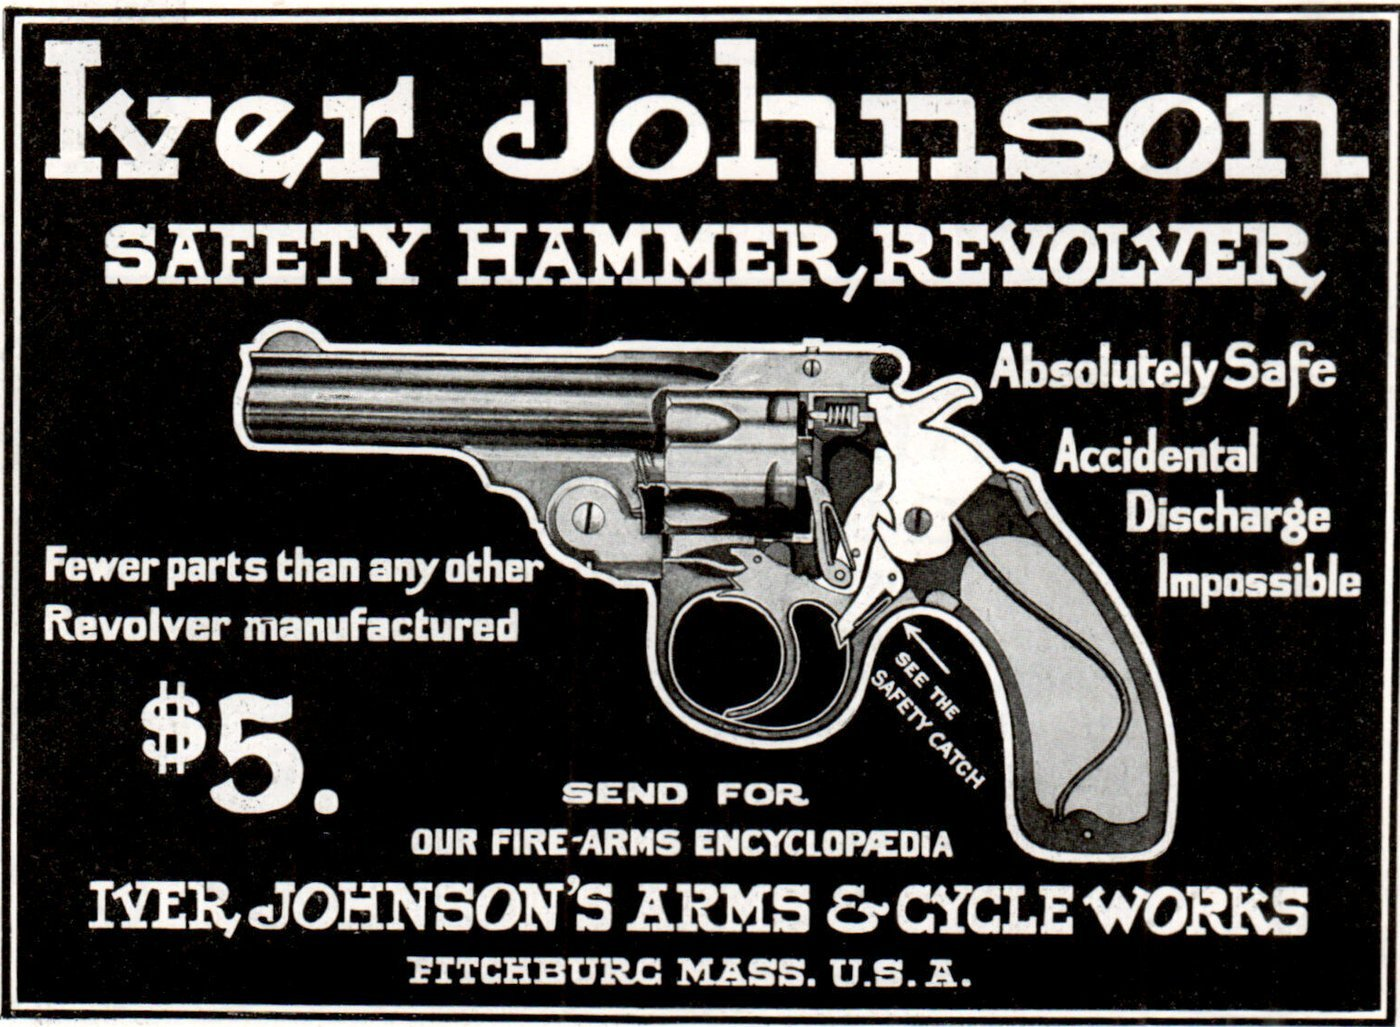 1904 Iver Johnson safety hammer revolver - Vintage guns